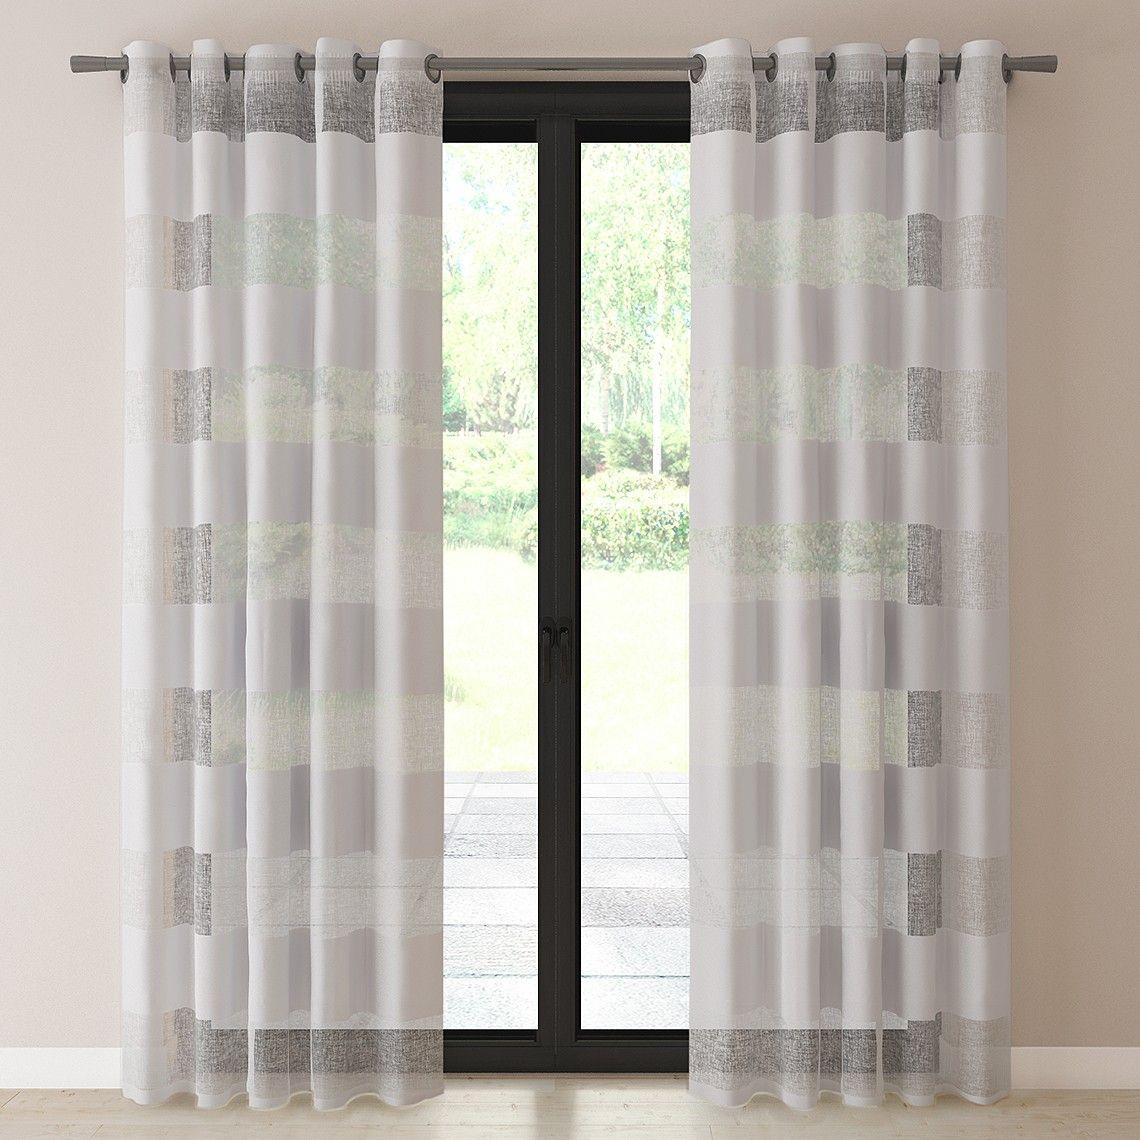 tissu eva blanc rayure horizontale blanc en 2019 si la. Black Bedroom Furniture Sets. Home Design Ideas